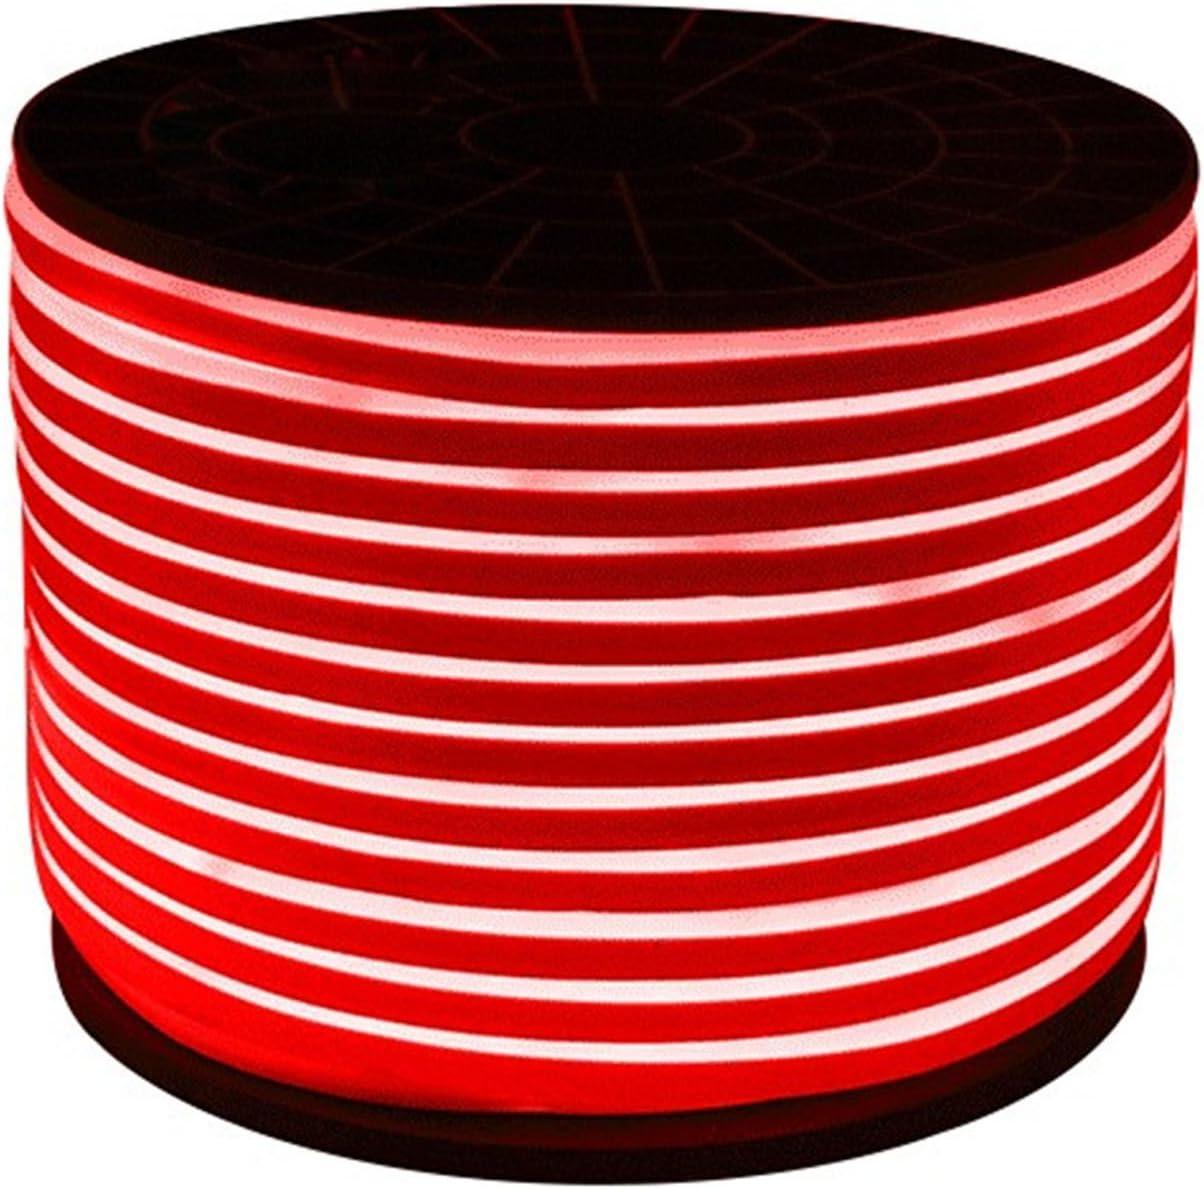 Ruanyi Luz de la Cuerda de neón de los 5M 600LED LED 2 alambres LED Neon Flex Dip Blanca llevó la Cinta de neón 220-240V / 110-130V (Color : Red)